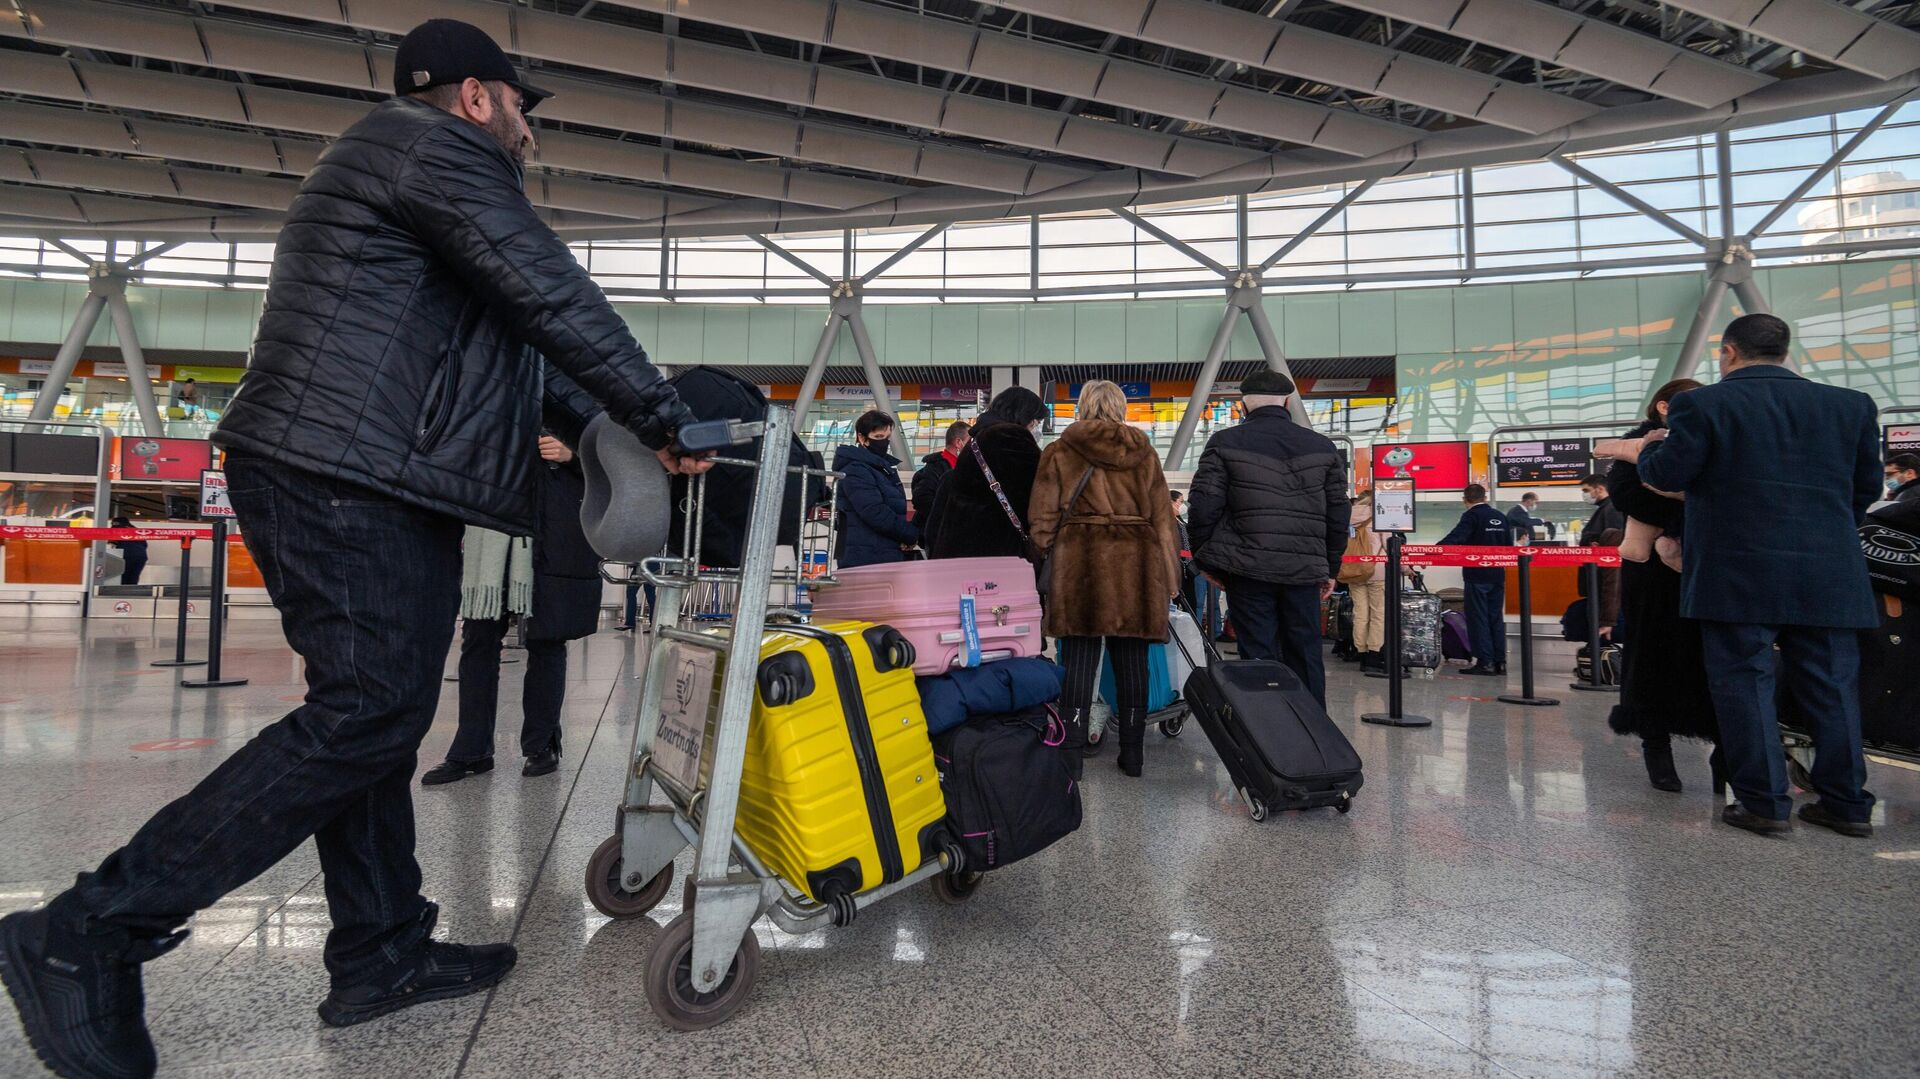 Пассажиры в Международном аэропорту Звартноц в Ереване - РИА Новости, 1920, 04.03.2021